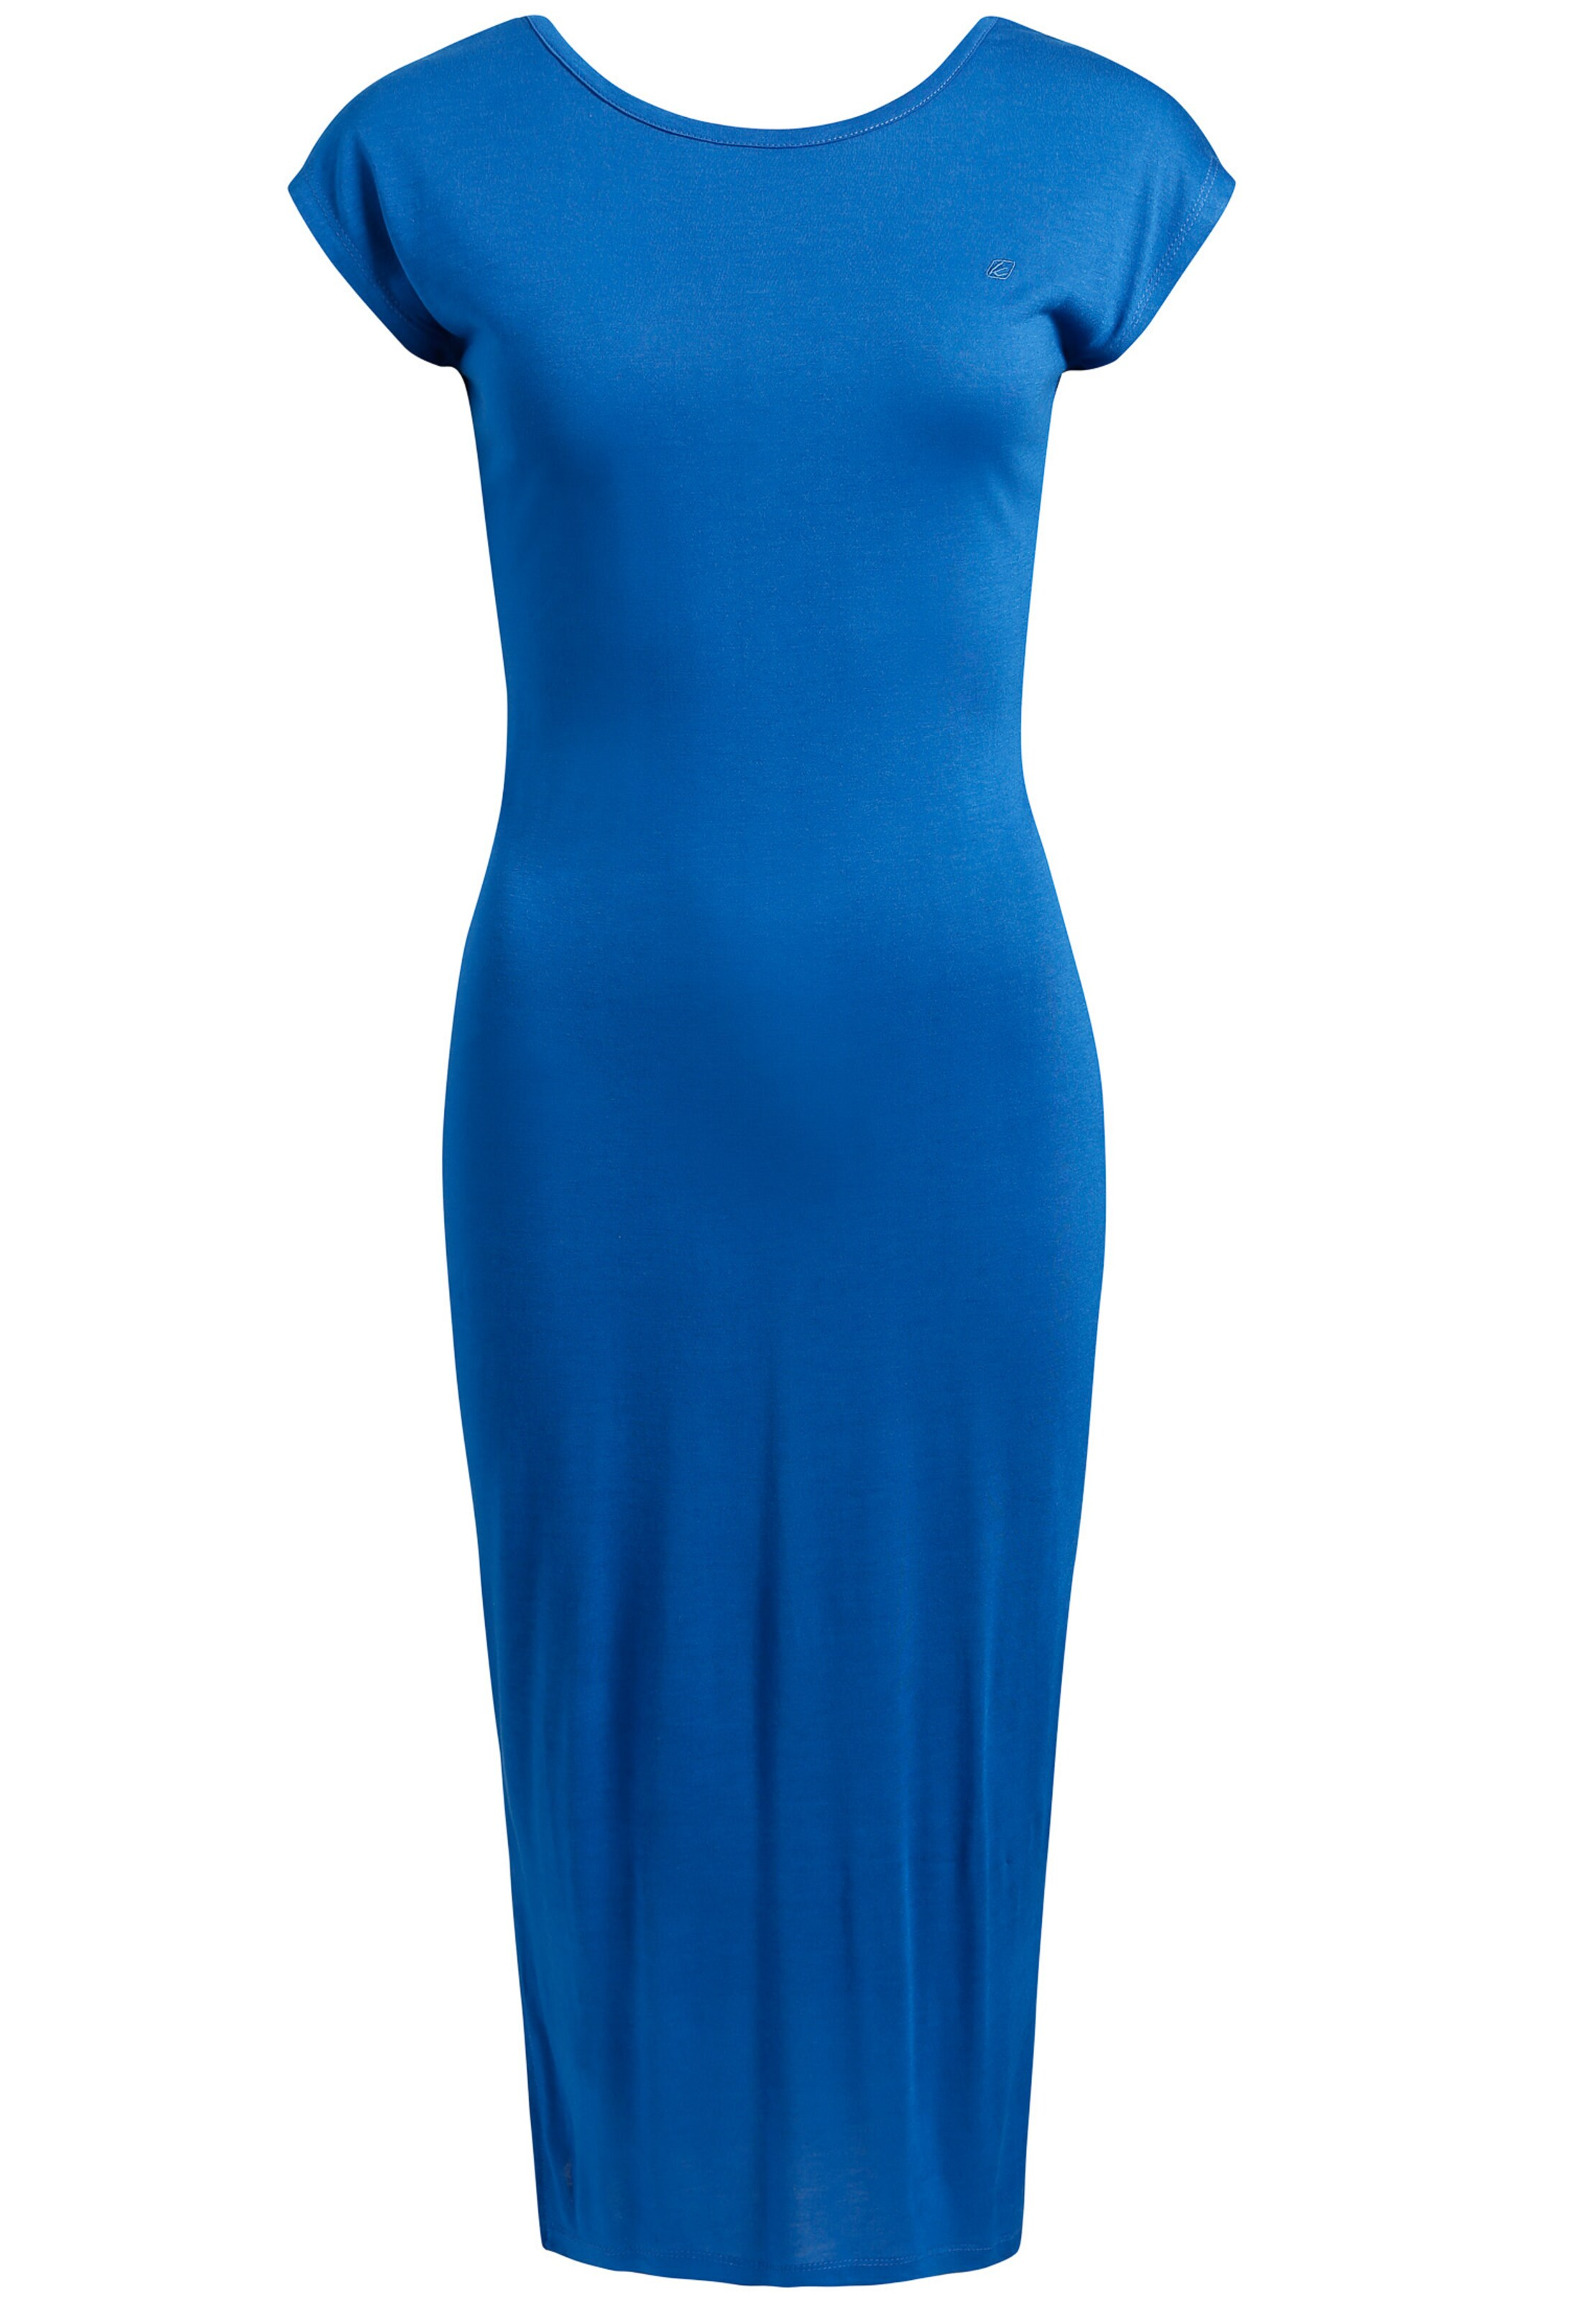 'alodia' Blau Khujo In Kleid Khujo Kleid j4R3ALq5